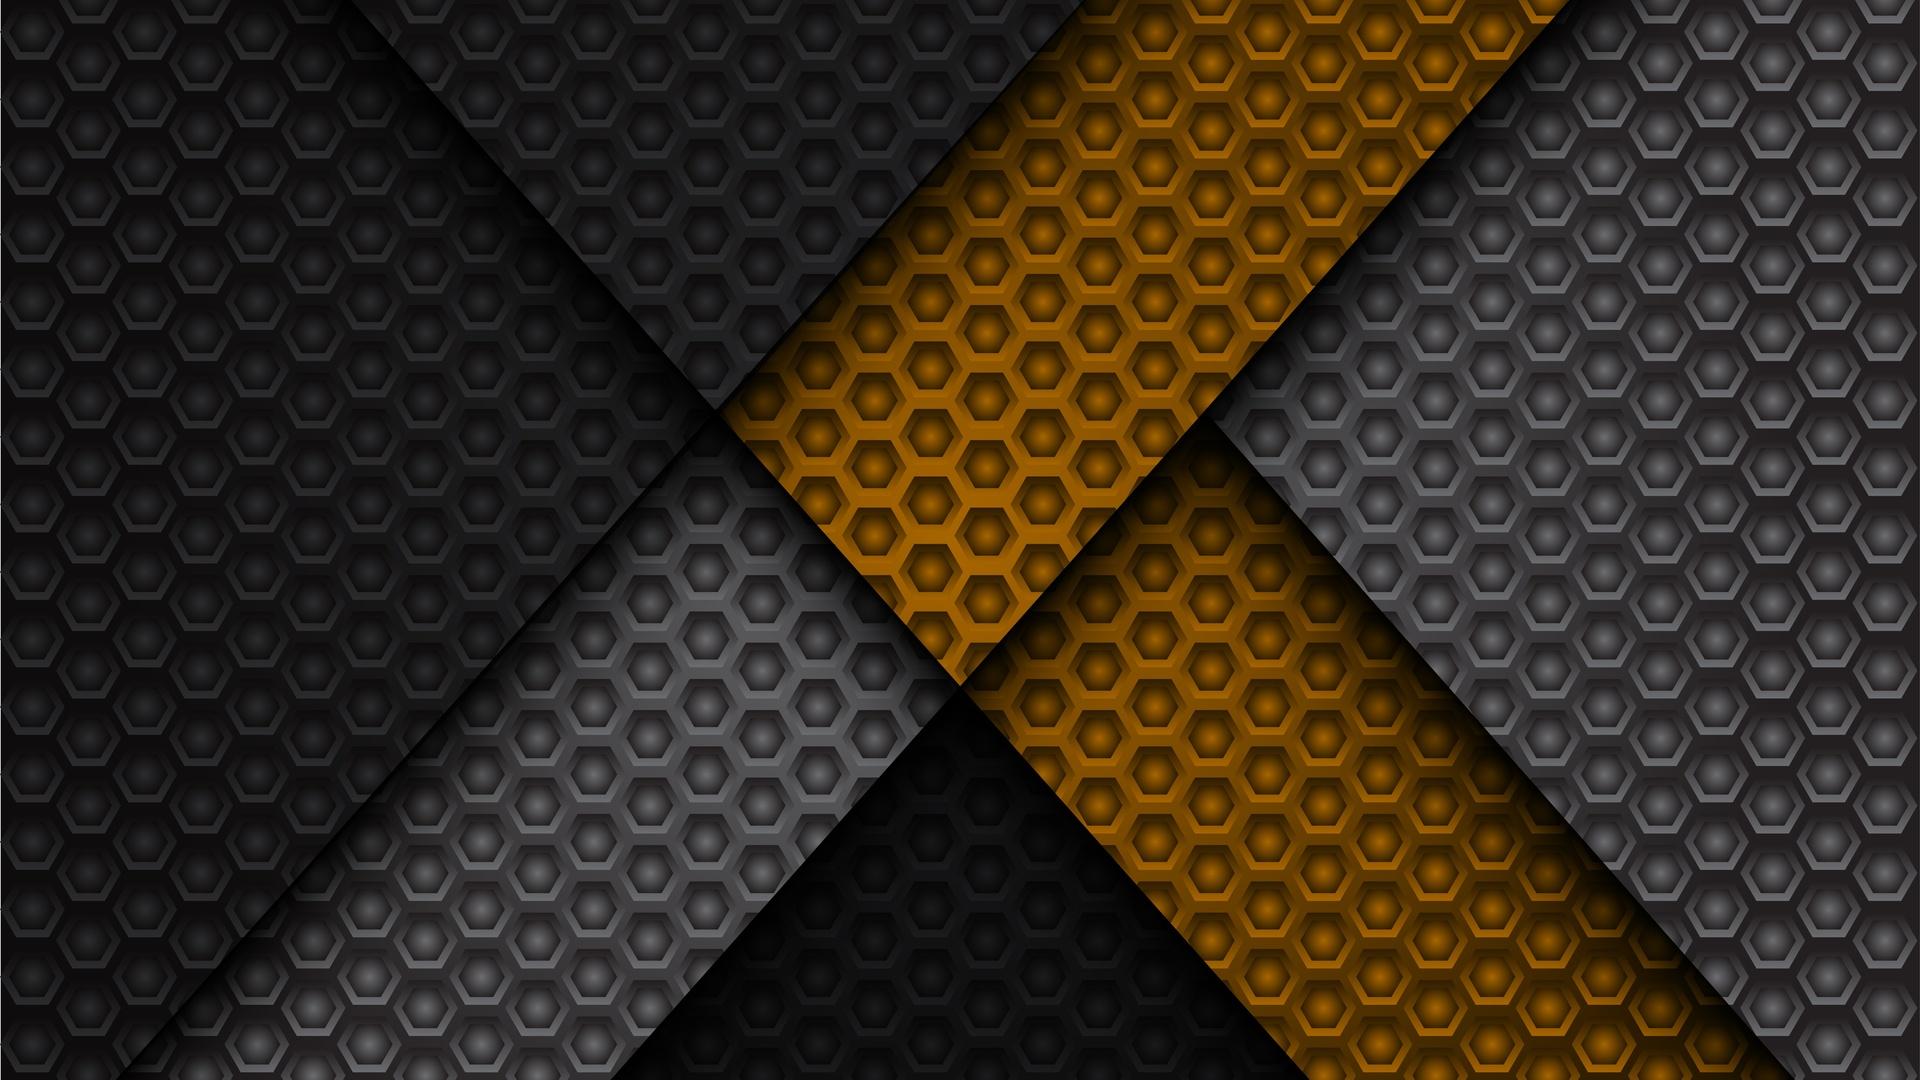 1920x1080 Pattern Texture 4k 5k Laptop Full HD 1080P HD 4k ...